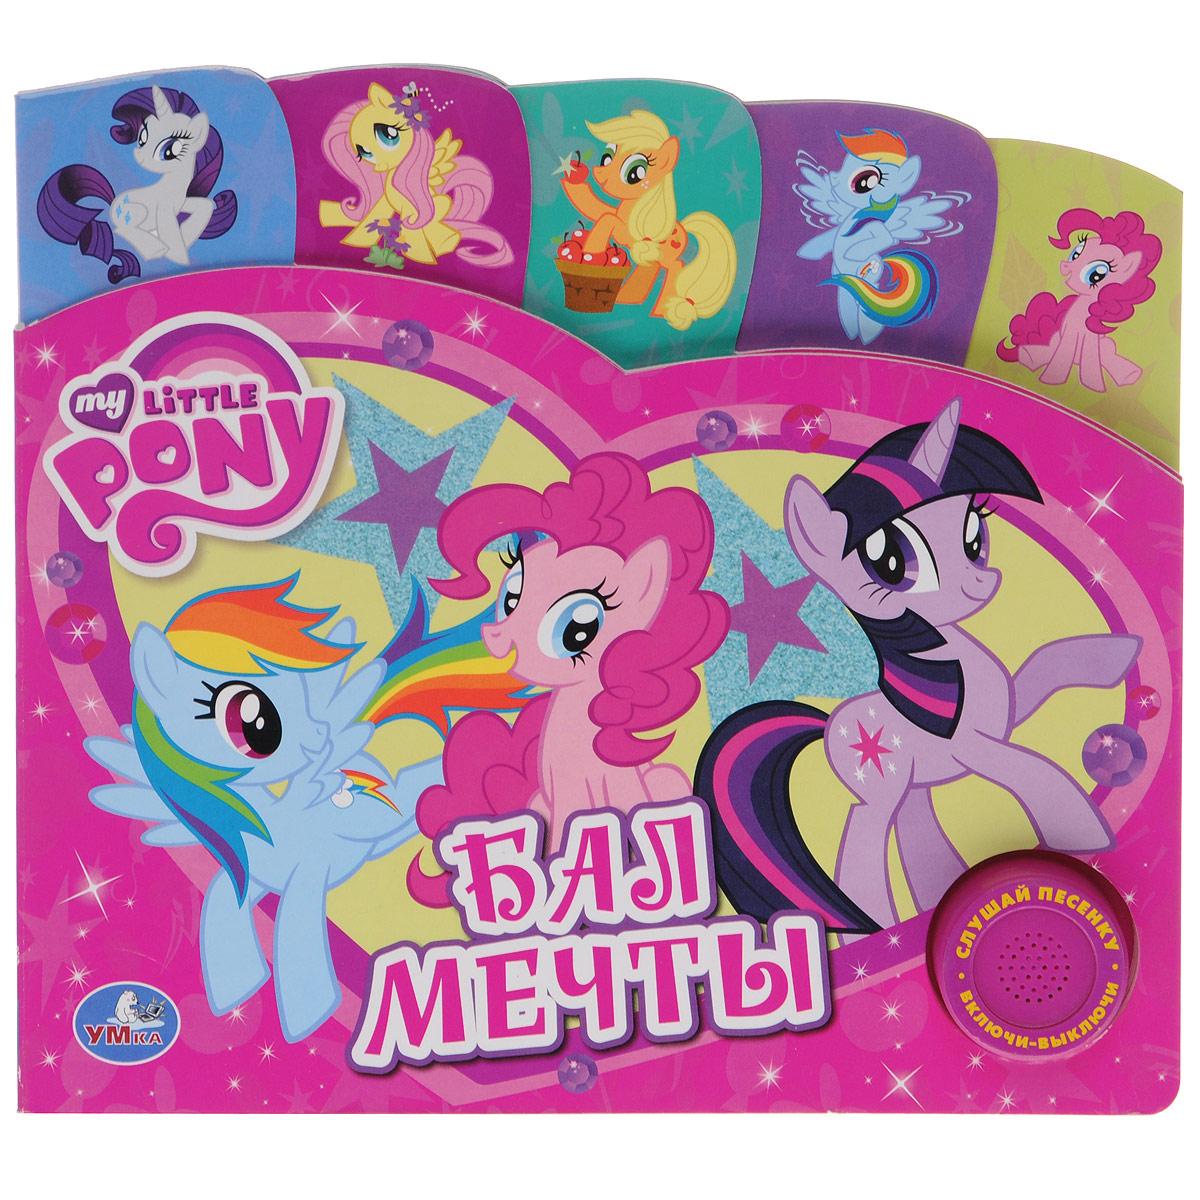 My Little Pony. Бал мечты. Книжка-игрушка